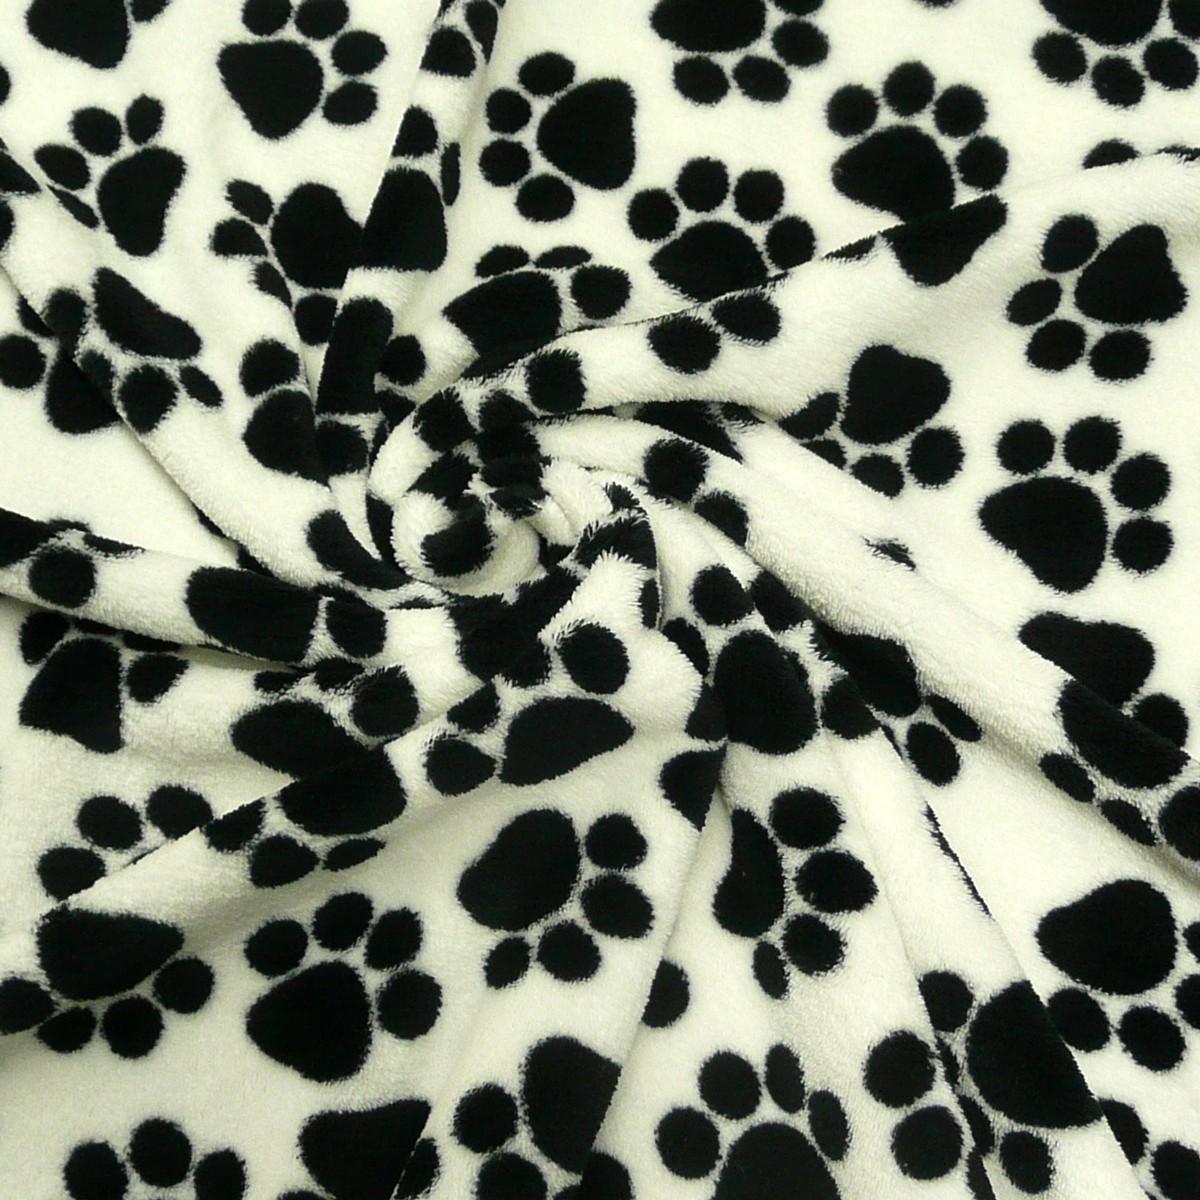 wellness fleece stoff wei mit pfoten tatzen alle stoffe stoffe gemustert stoff tiermotive. Black Bedroom Furniture Sets. Home Design Ideas